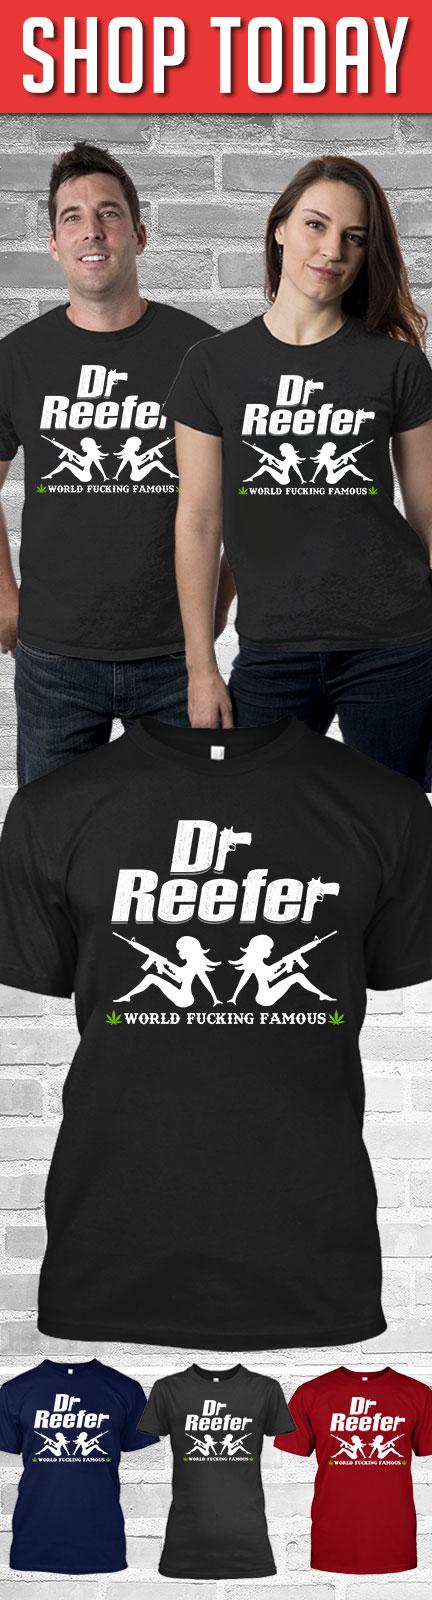 DrReefer World Fucking Famous 2 Shirt